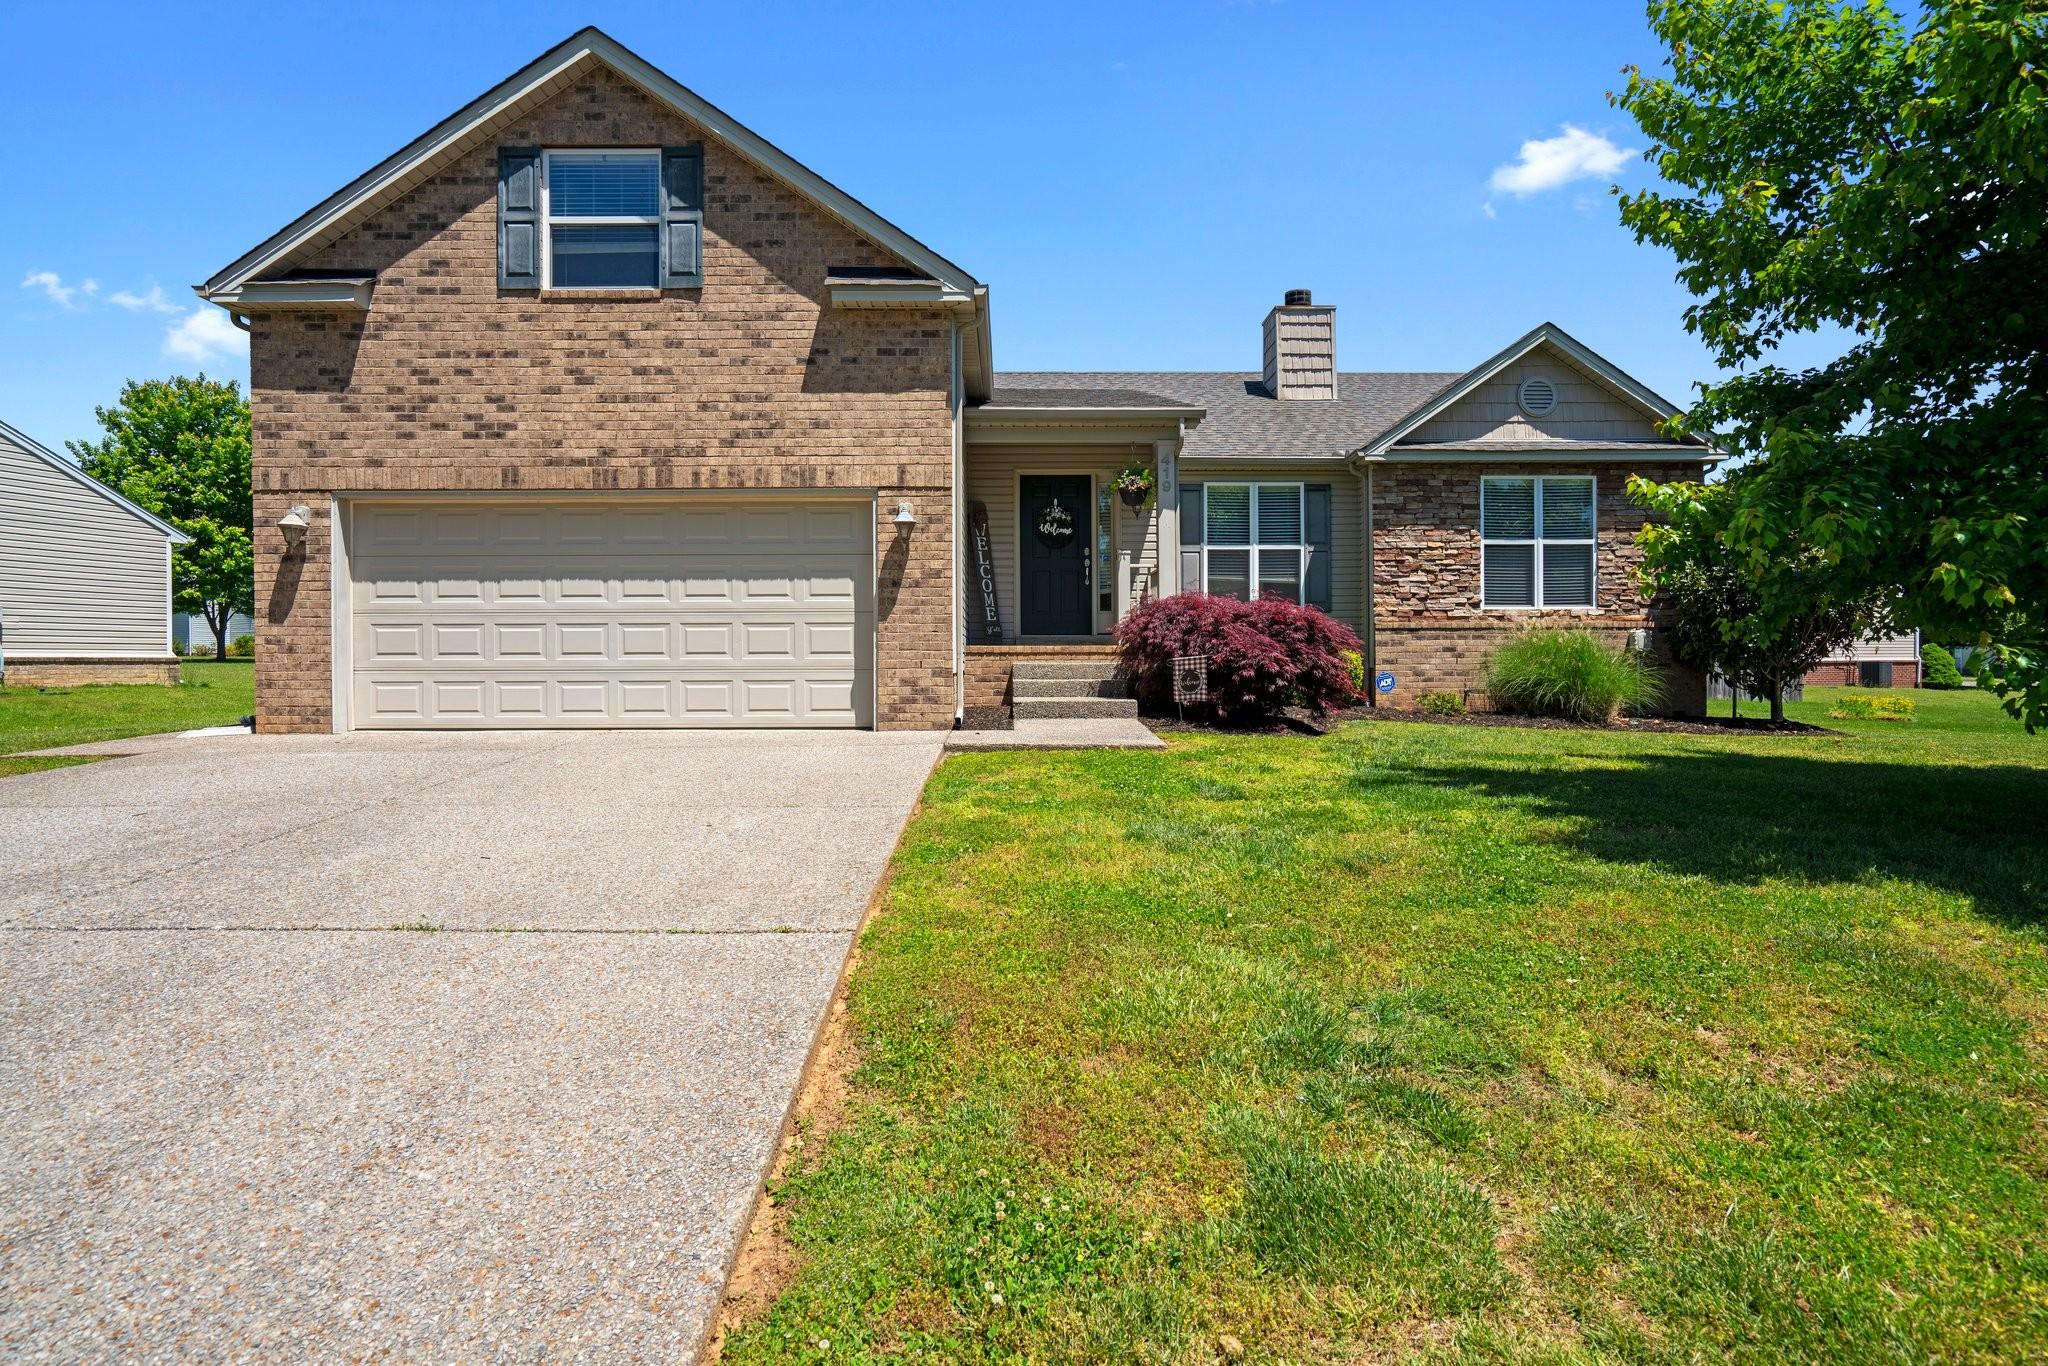 Beautiful 3 BR/2 BA Home In Desirable Neighborhood!  419 W Winterberry Trail, White House, TN.  37188